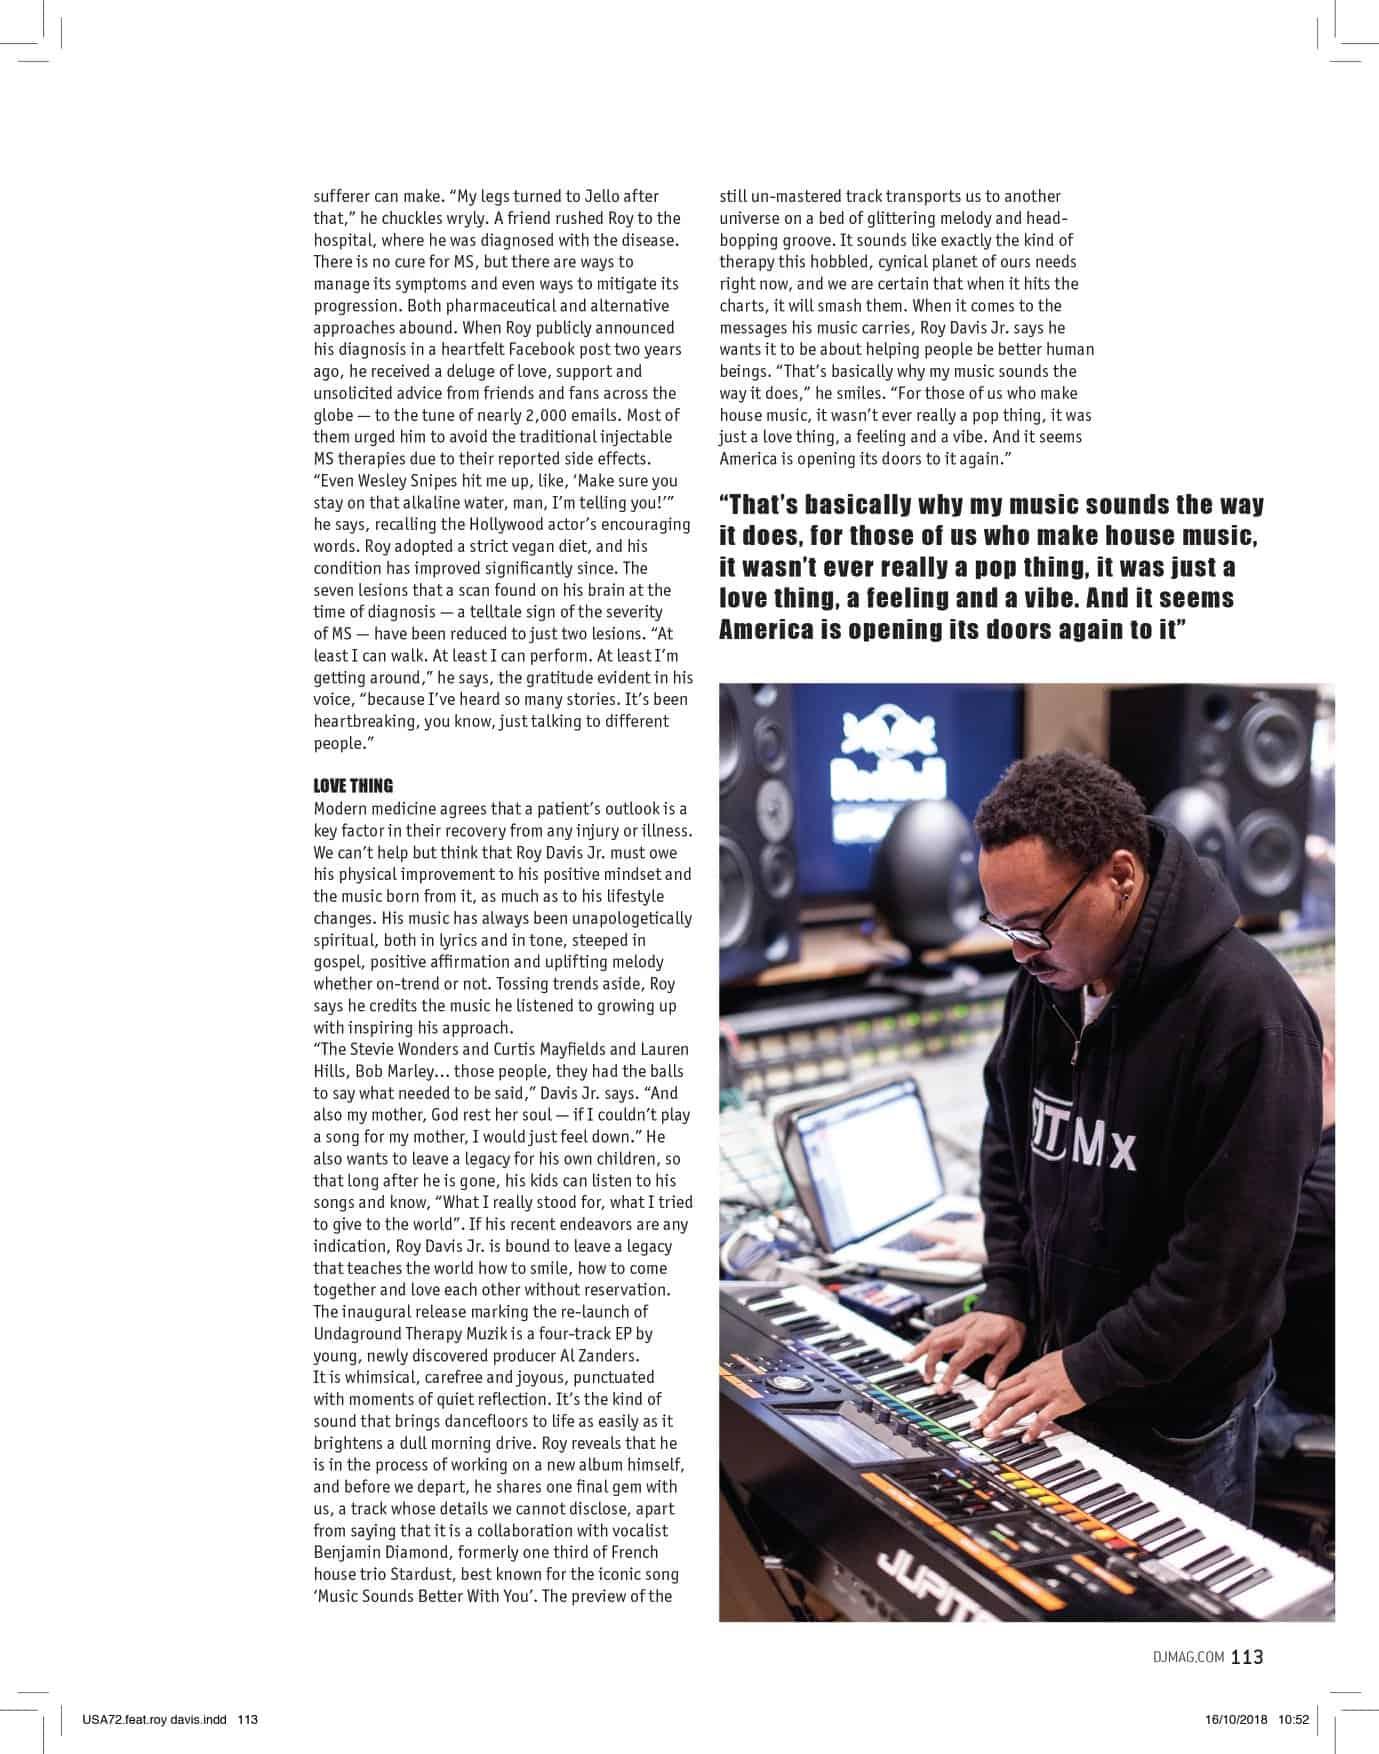 46473844_1061017340736285_3496729177153863680_o DJ Mag's November issue 3 Page spread